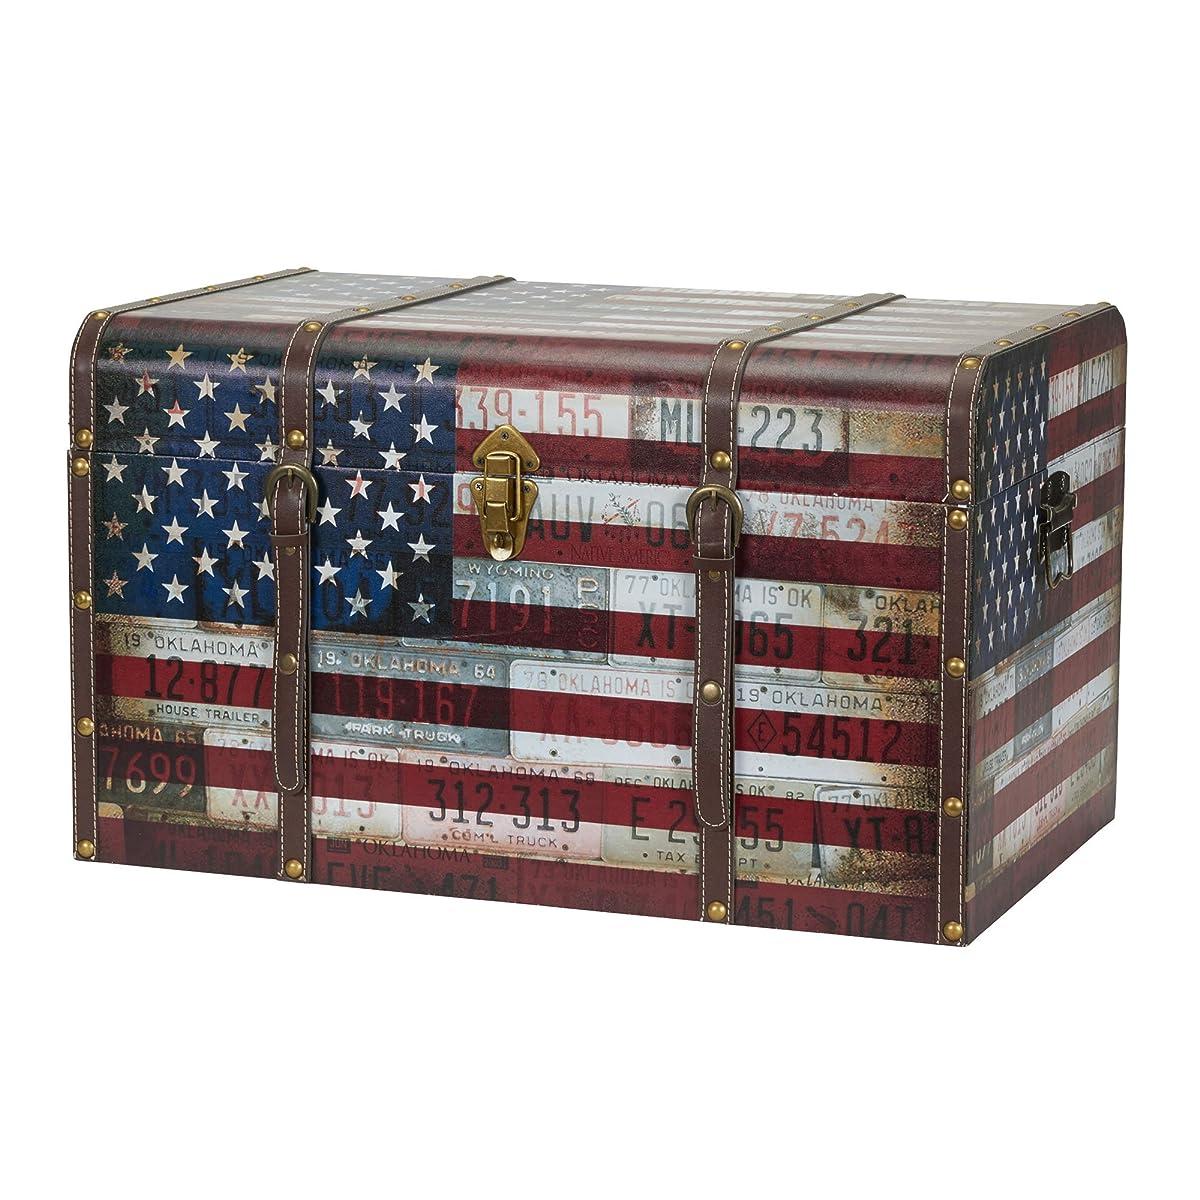 Household Essentials 9203-1 Jumbo Decorative Home Storage Trunk - Luggage Style – Americana Design